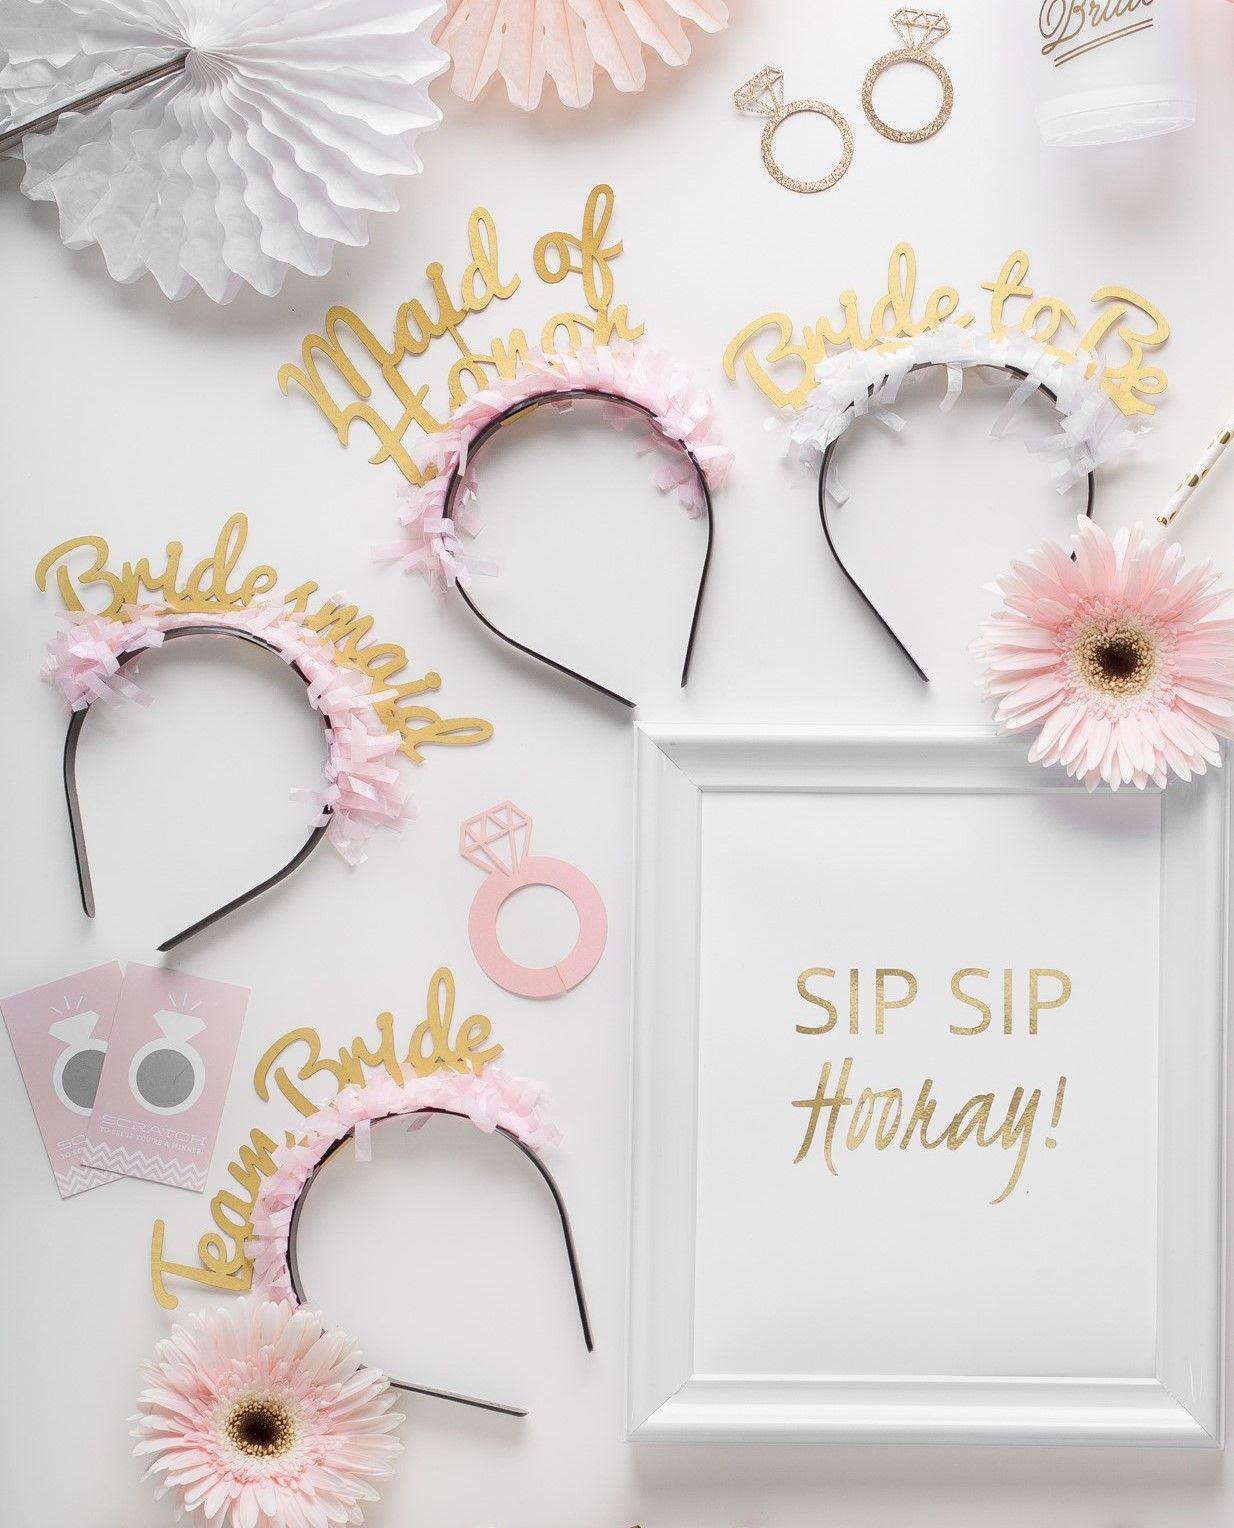 Sip Sip Hooray - Prȇt-à-Party Box | Junggesellenabschied, Brautparty ...